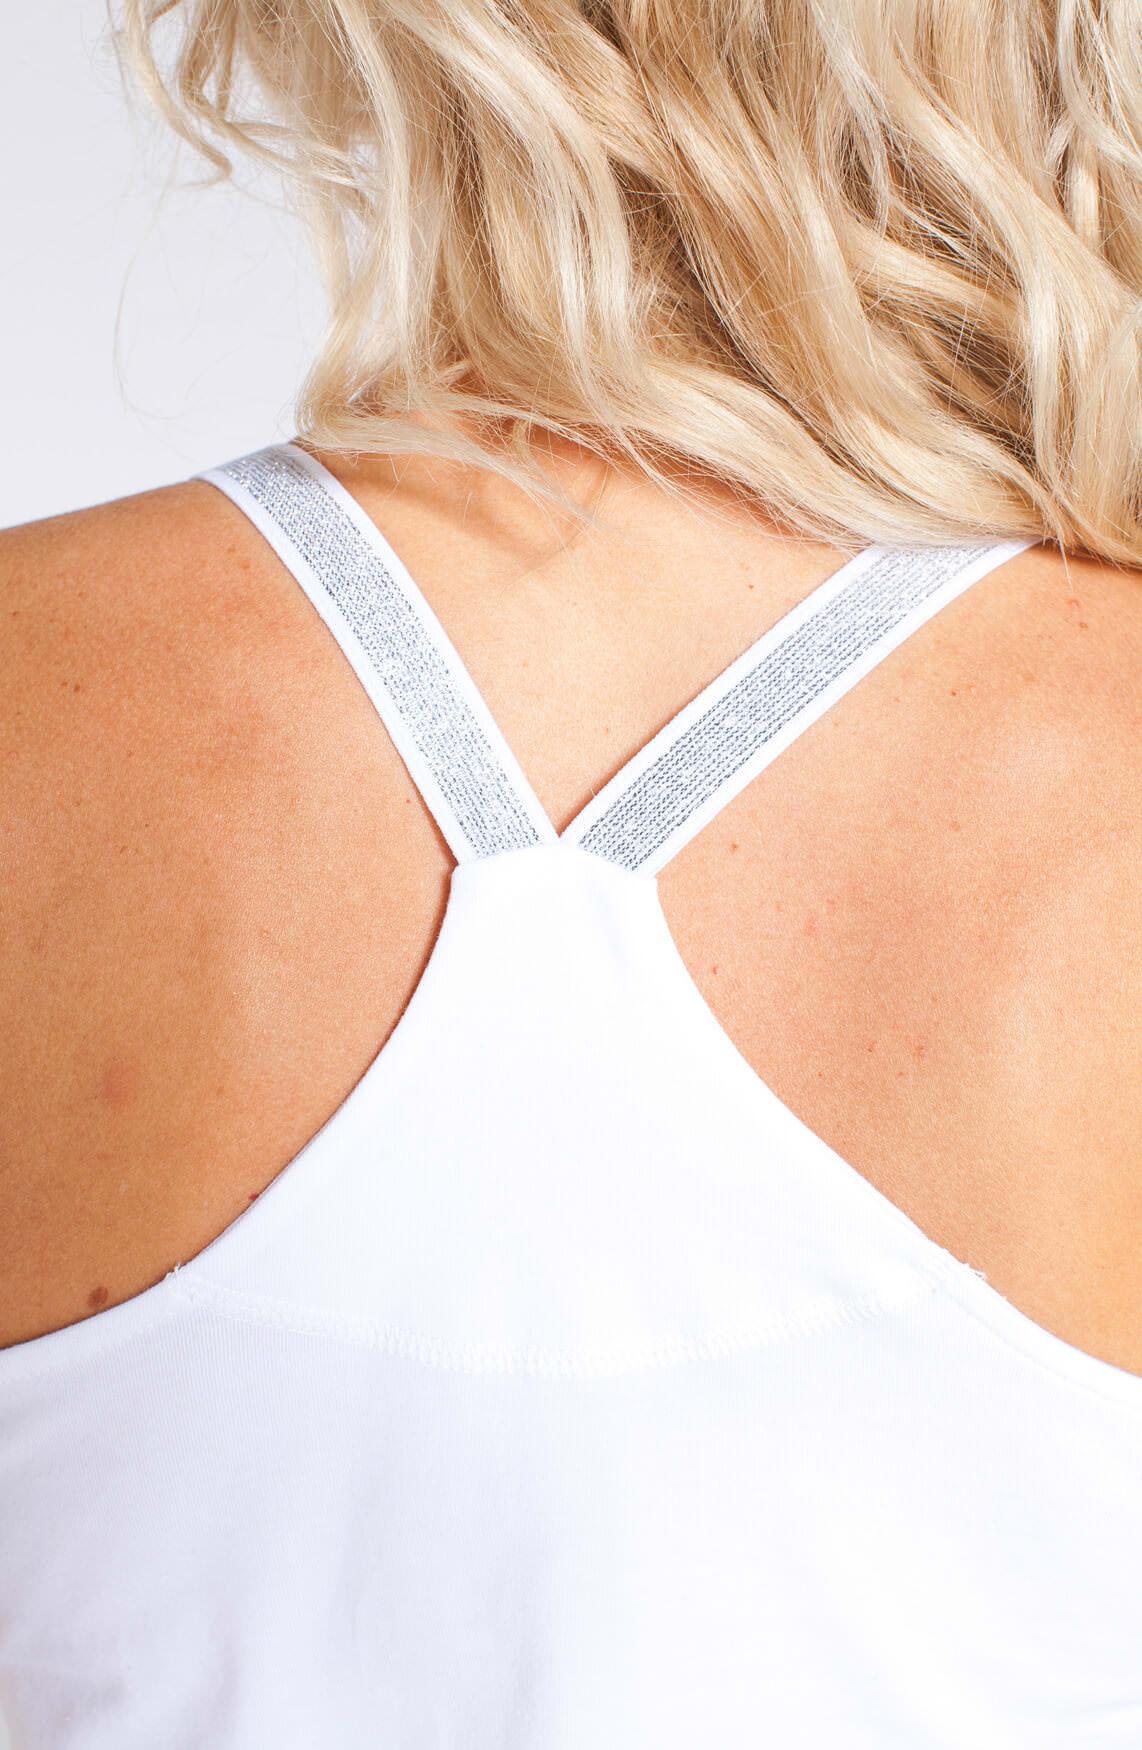 Anna Dames Top met lurex bandjes wit